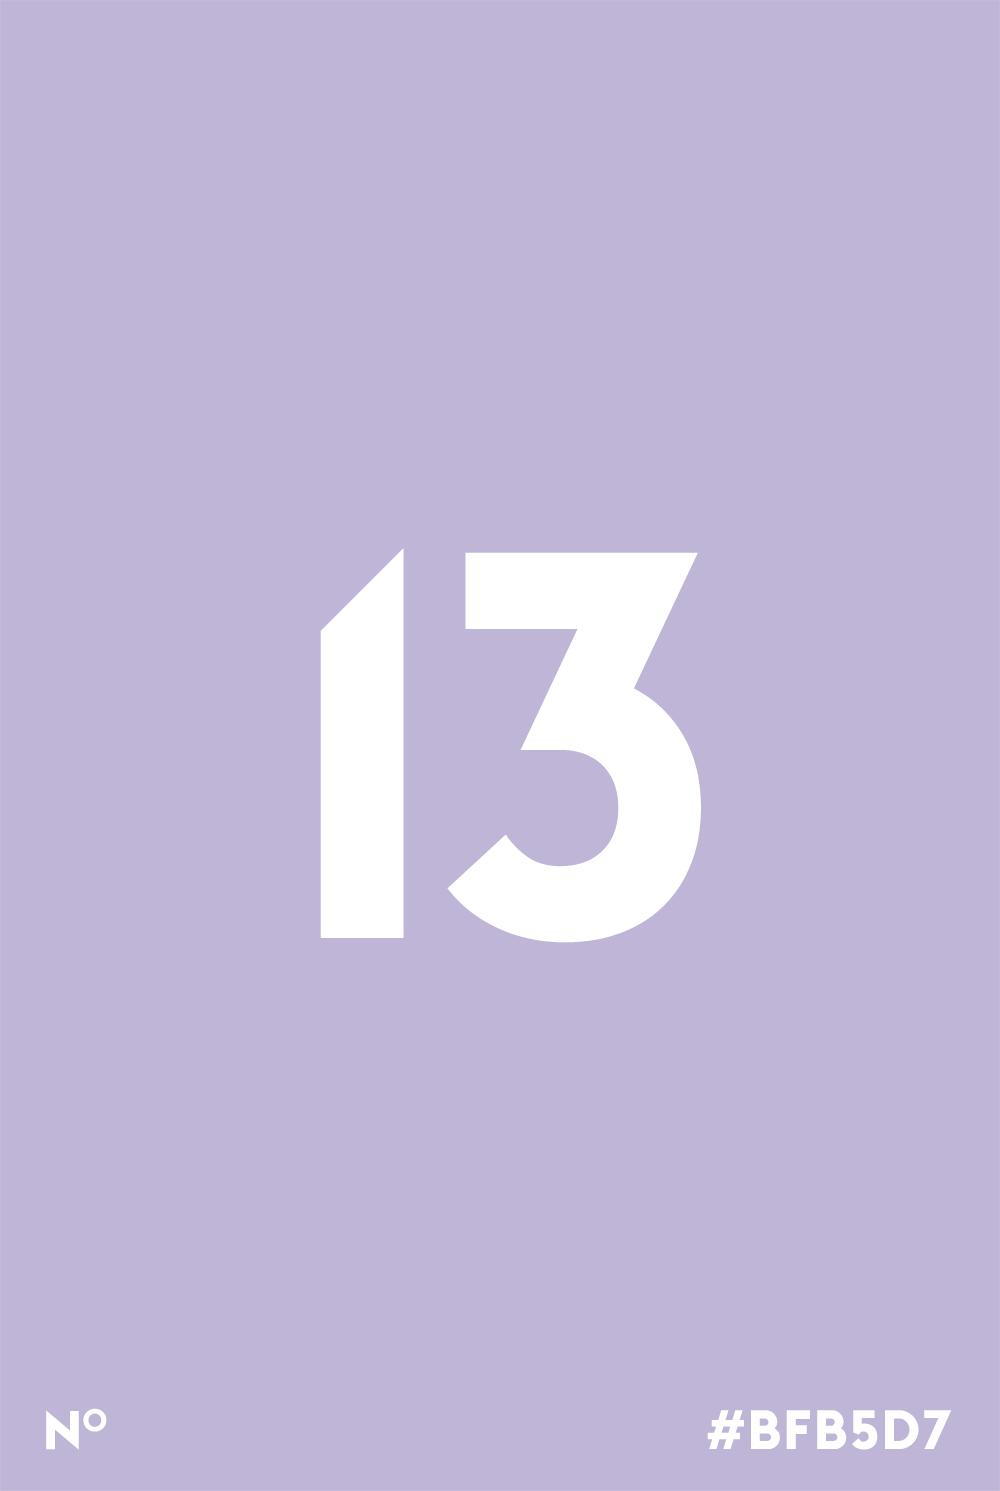 cc_0012_13